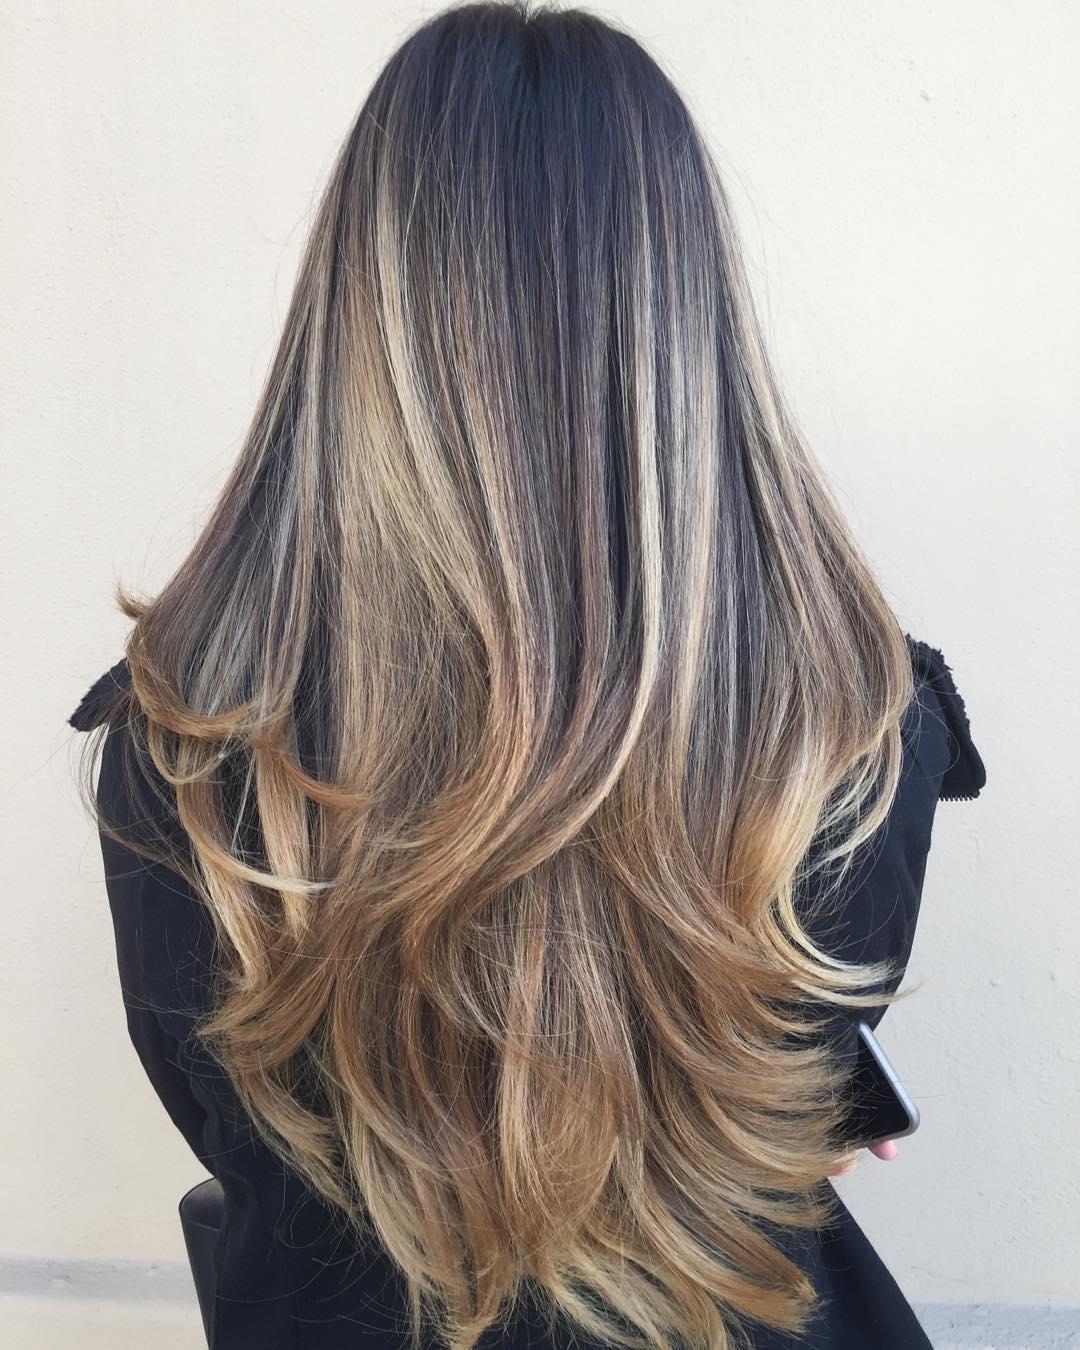 Long Layered High-Contrast Balayage Hair